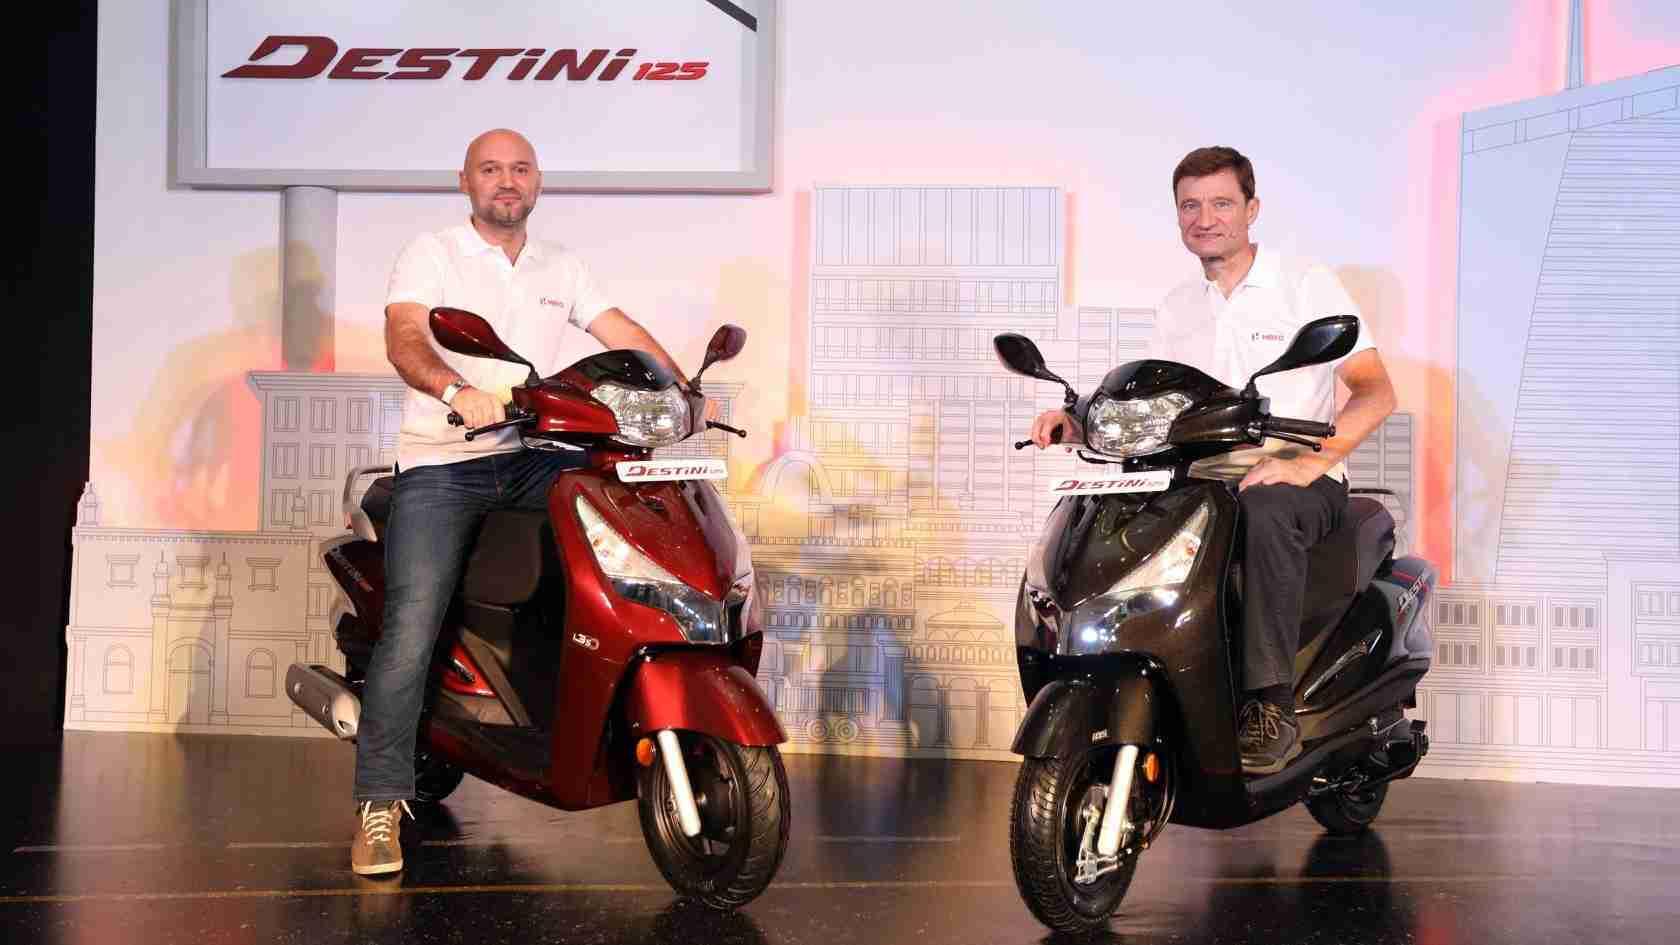 Hero Destini 125 scooter